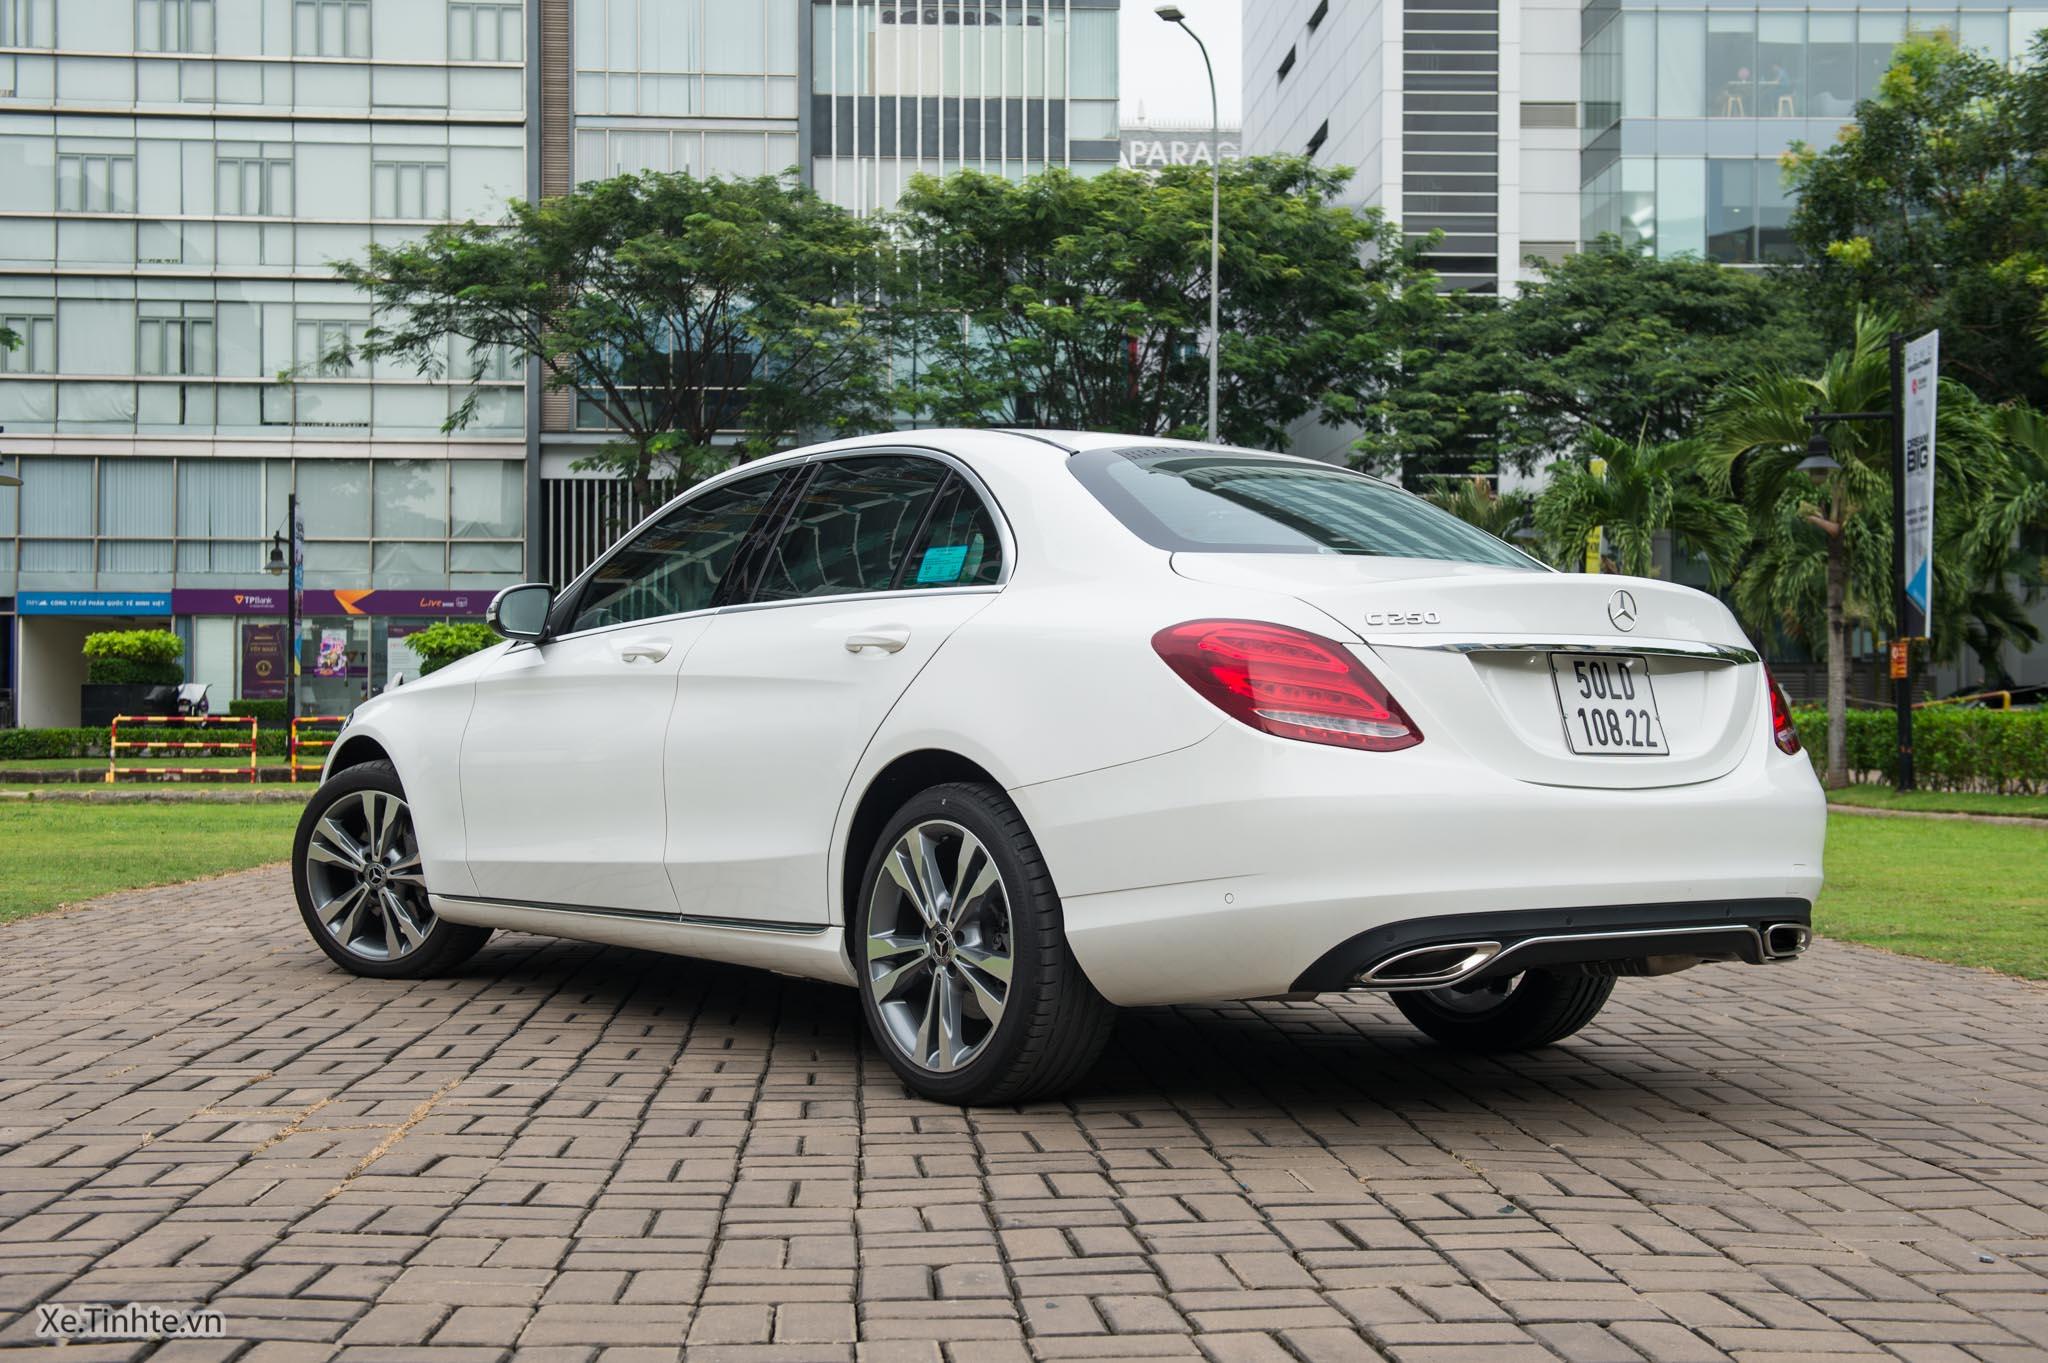 Mercedes_C250 Exclusive_Xe.tinhte.vn-7210.jpg